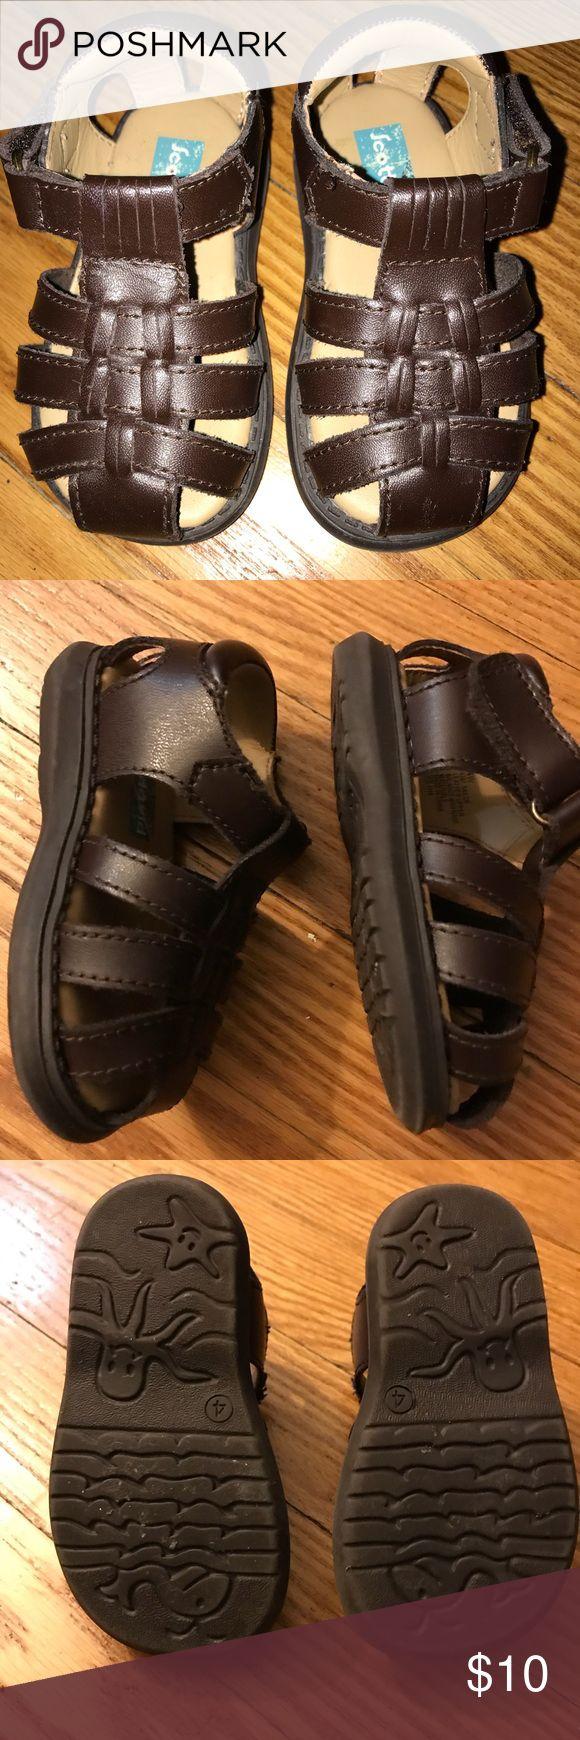 Baby real leather sandals Real leather Scott Scott Davis brown infant sandals. Size 4 Scott David Shoes Sandals & Flip Flops